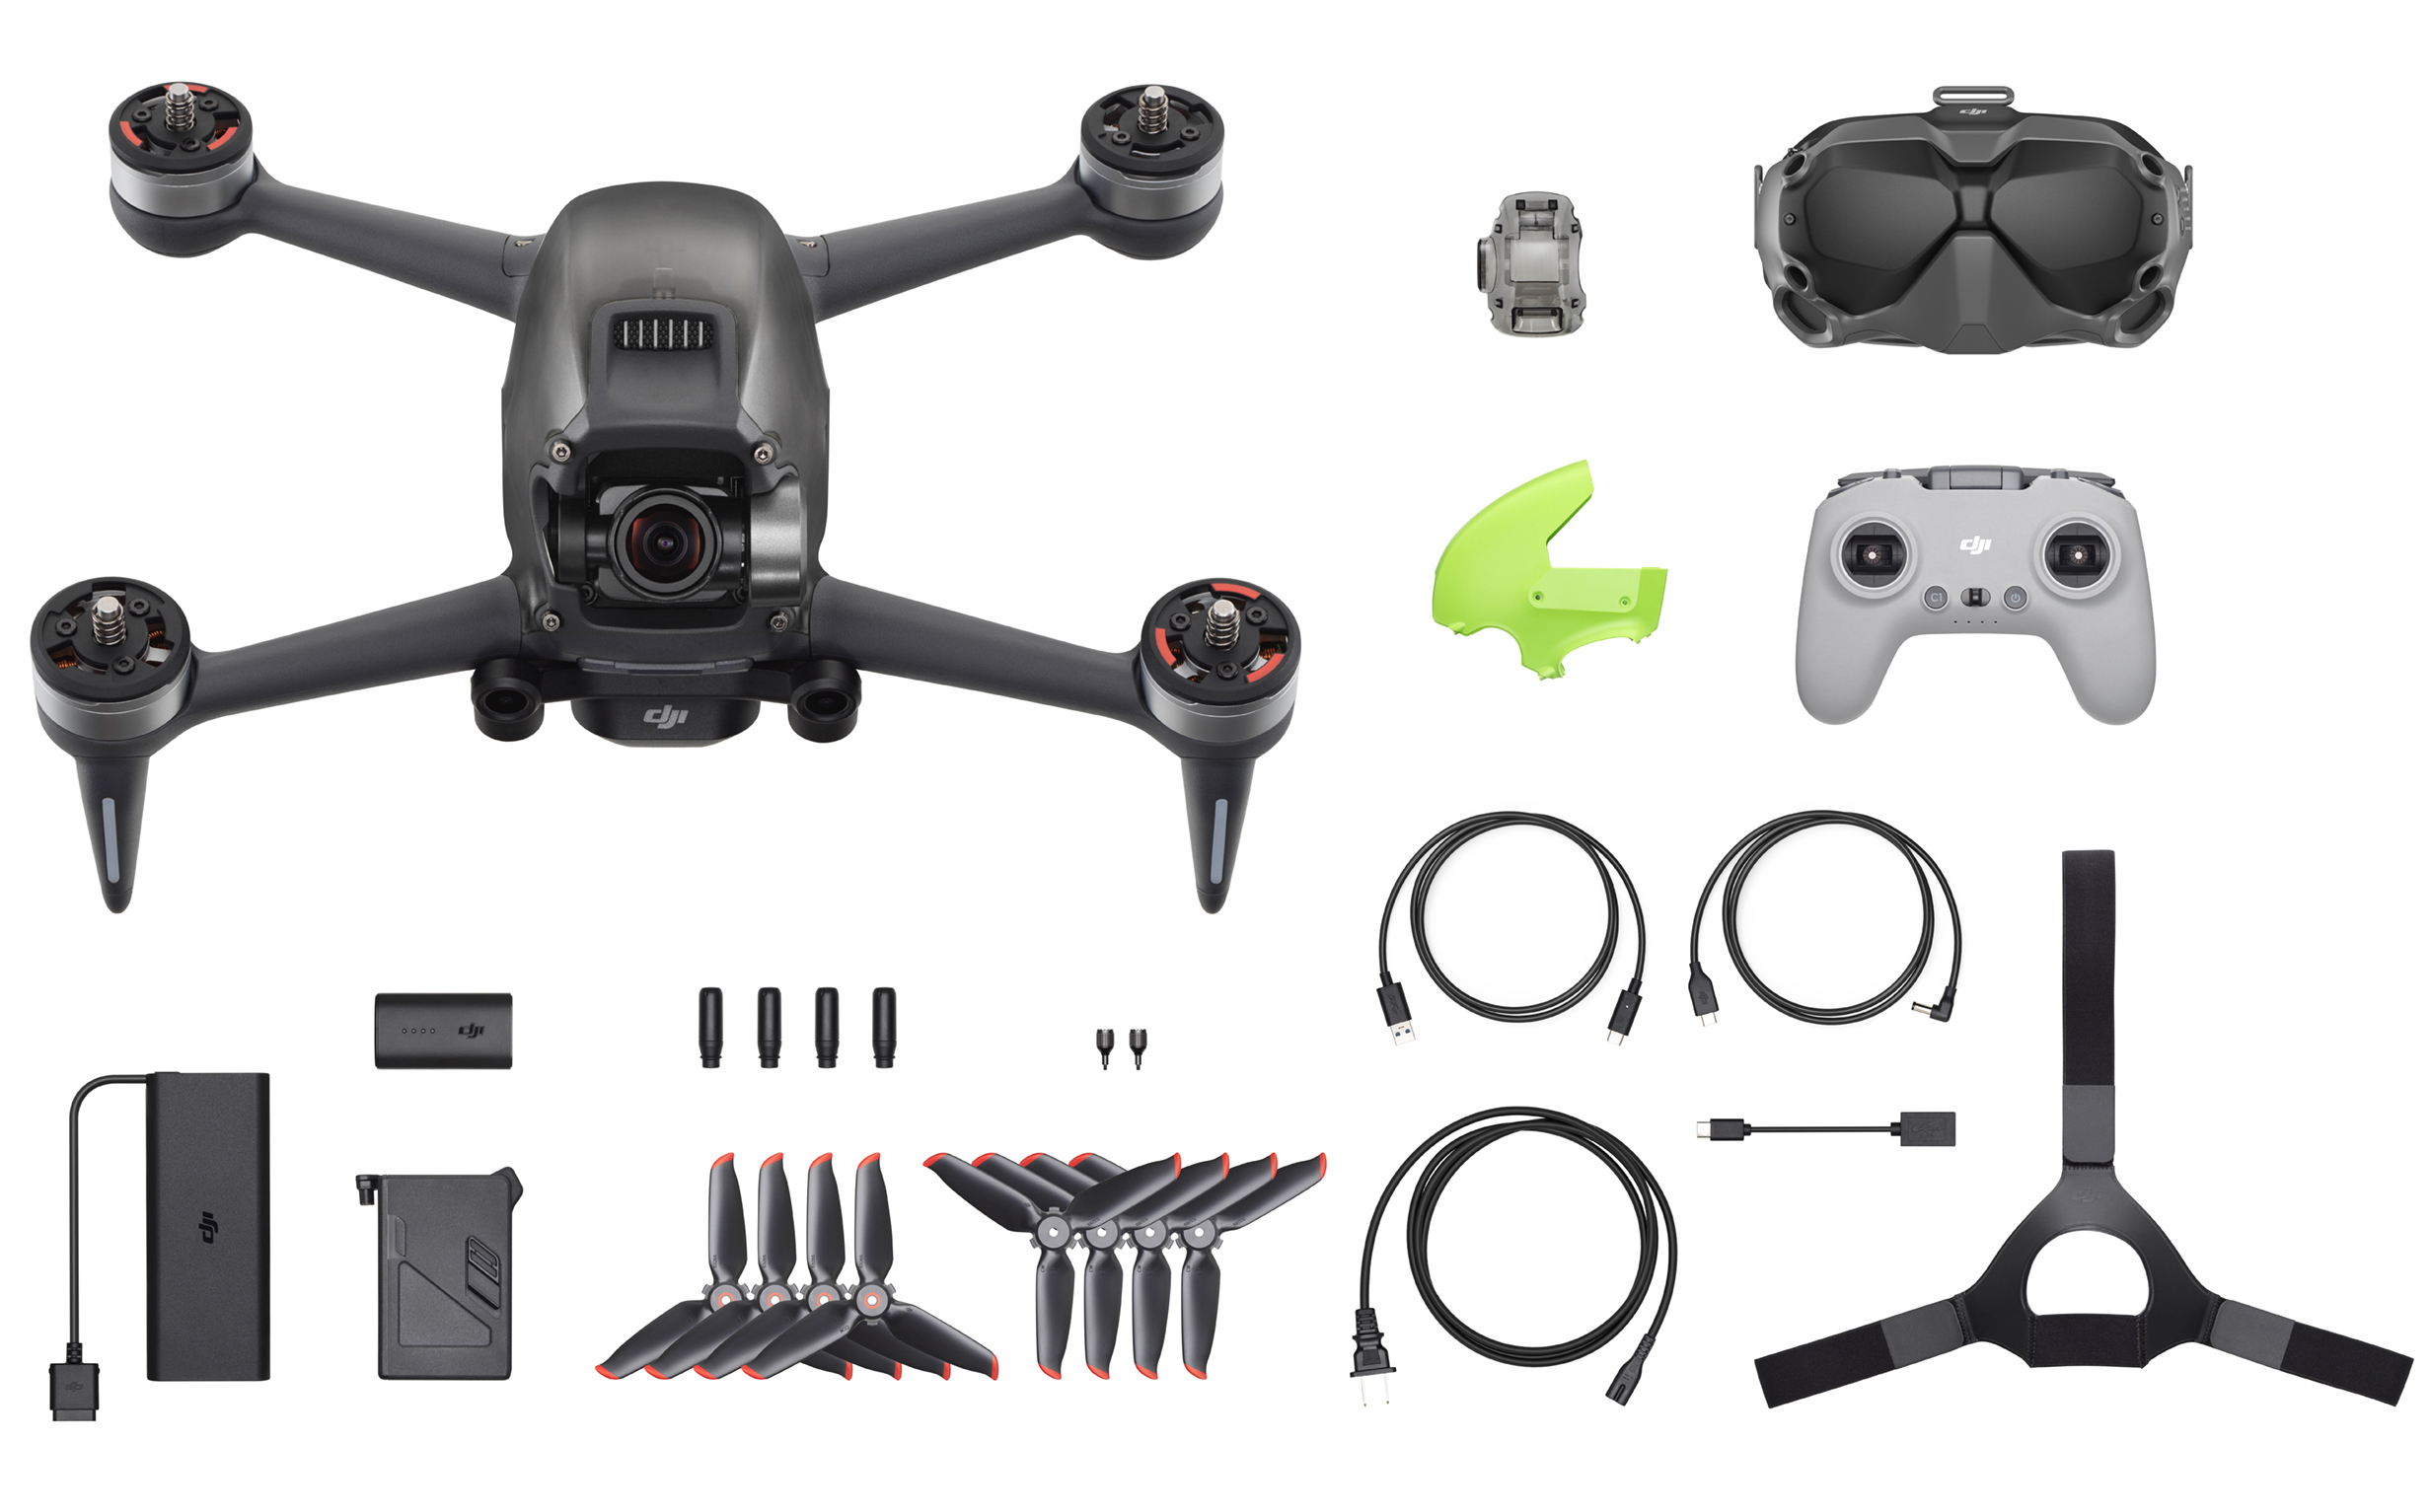 DJI FPV Drone and accessories